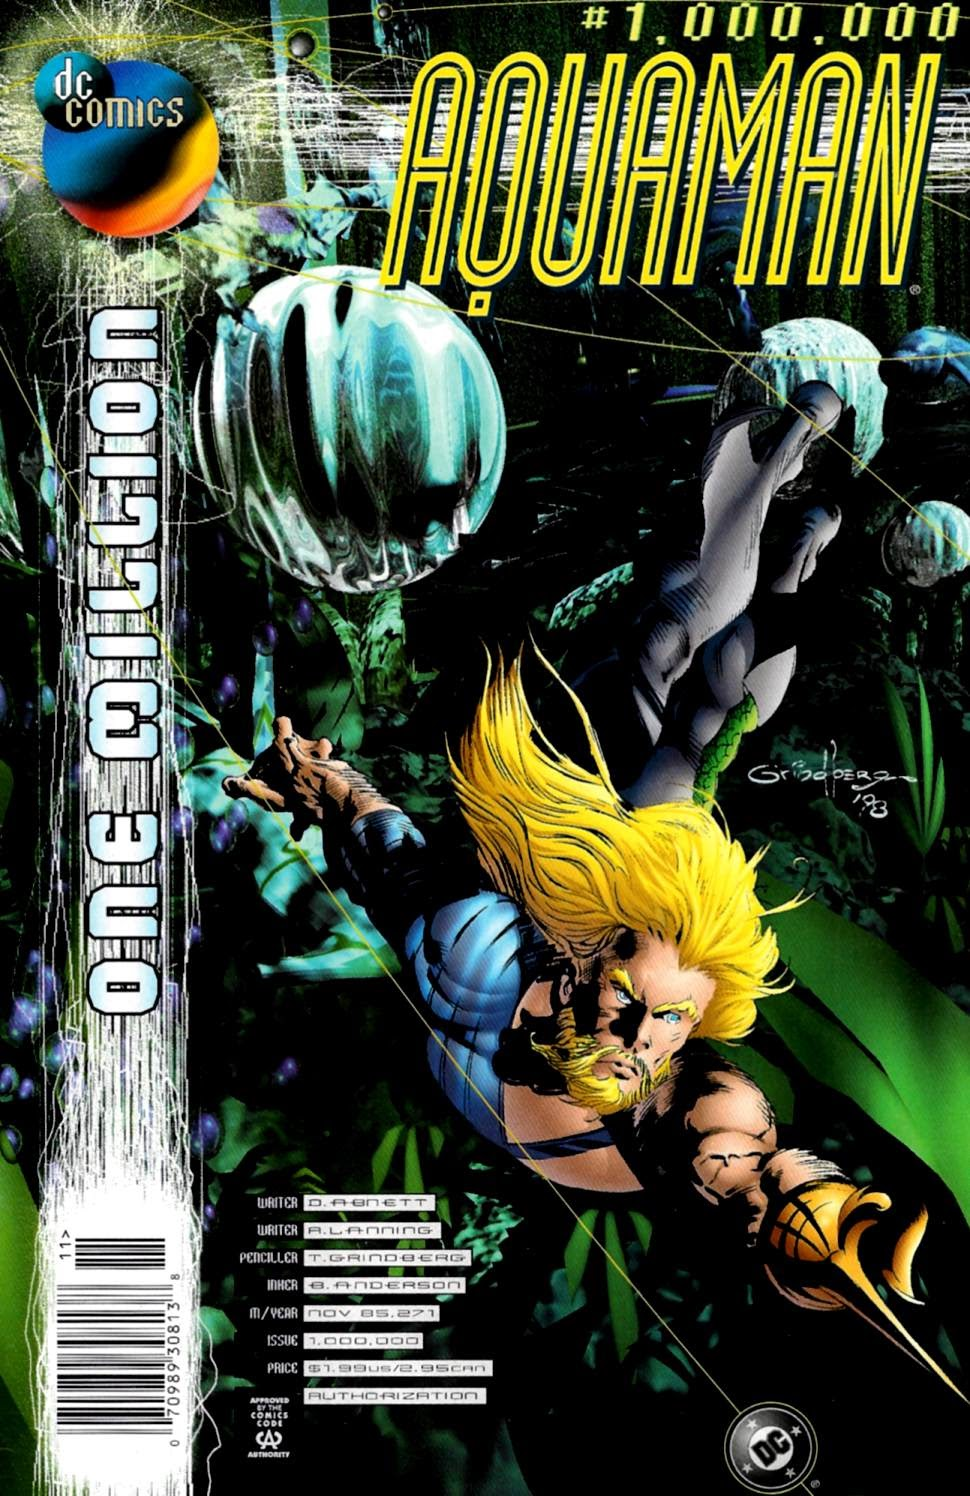 Aquaman (1994) 1000000 Page 1